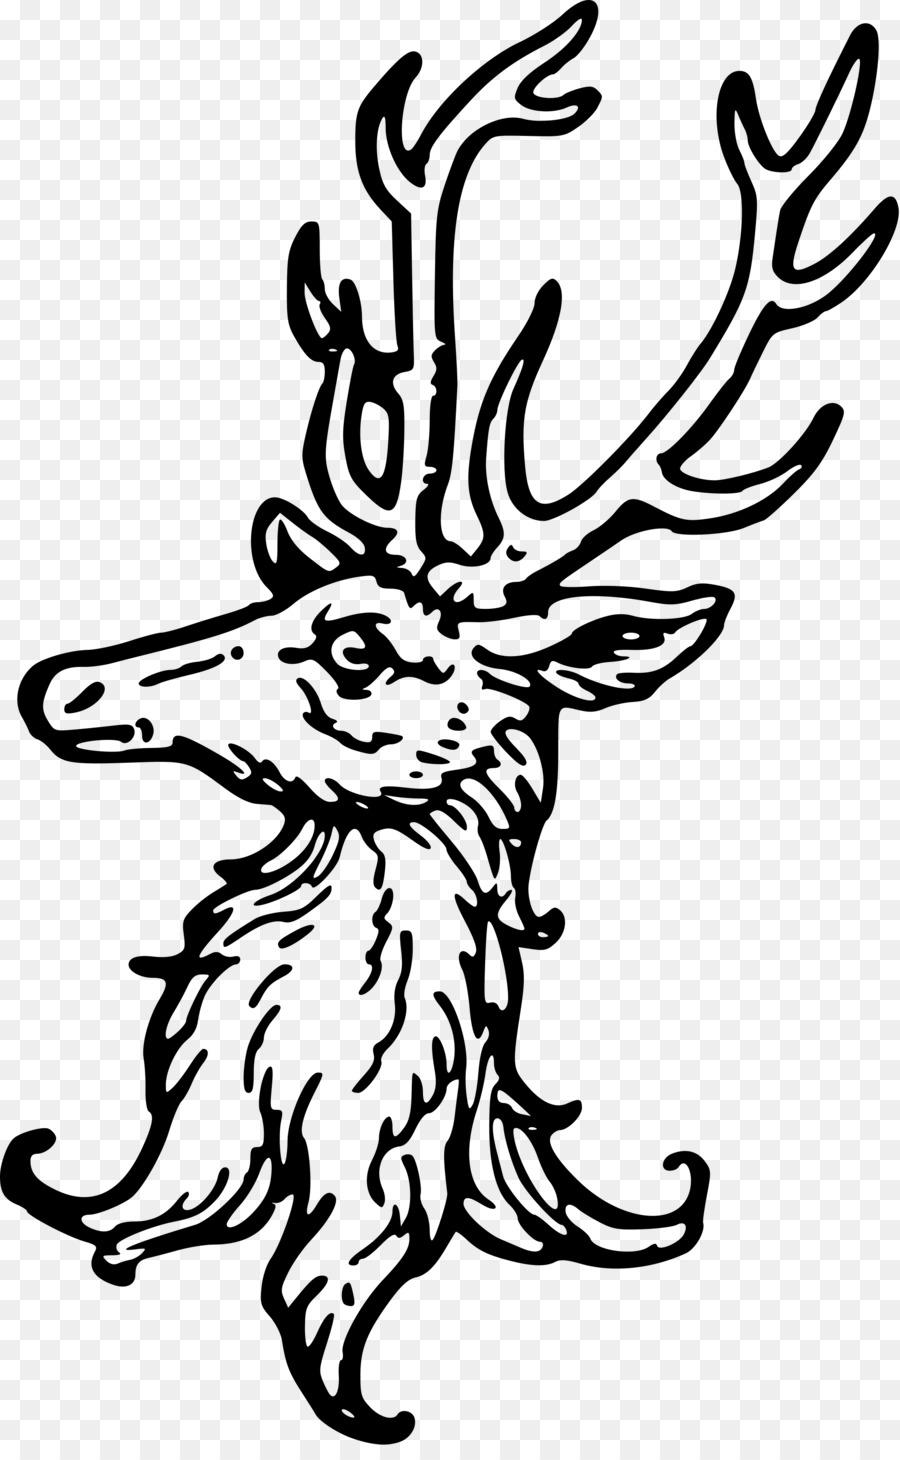 deer complete guide to heraldry drawing clip art lions head png rh kisspng com heraldry clipart download heraldic clip art of bird